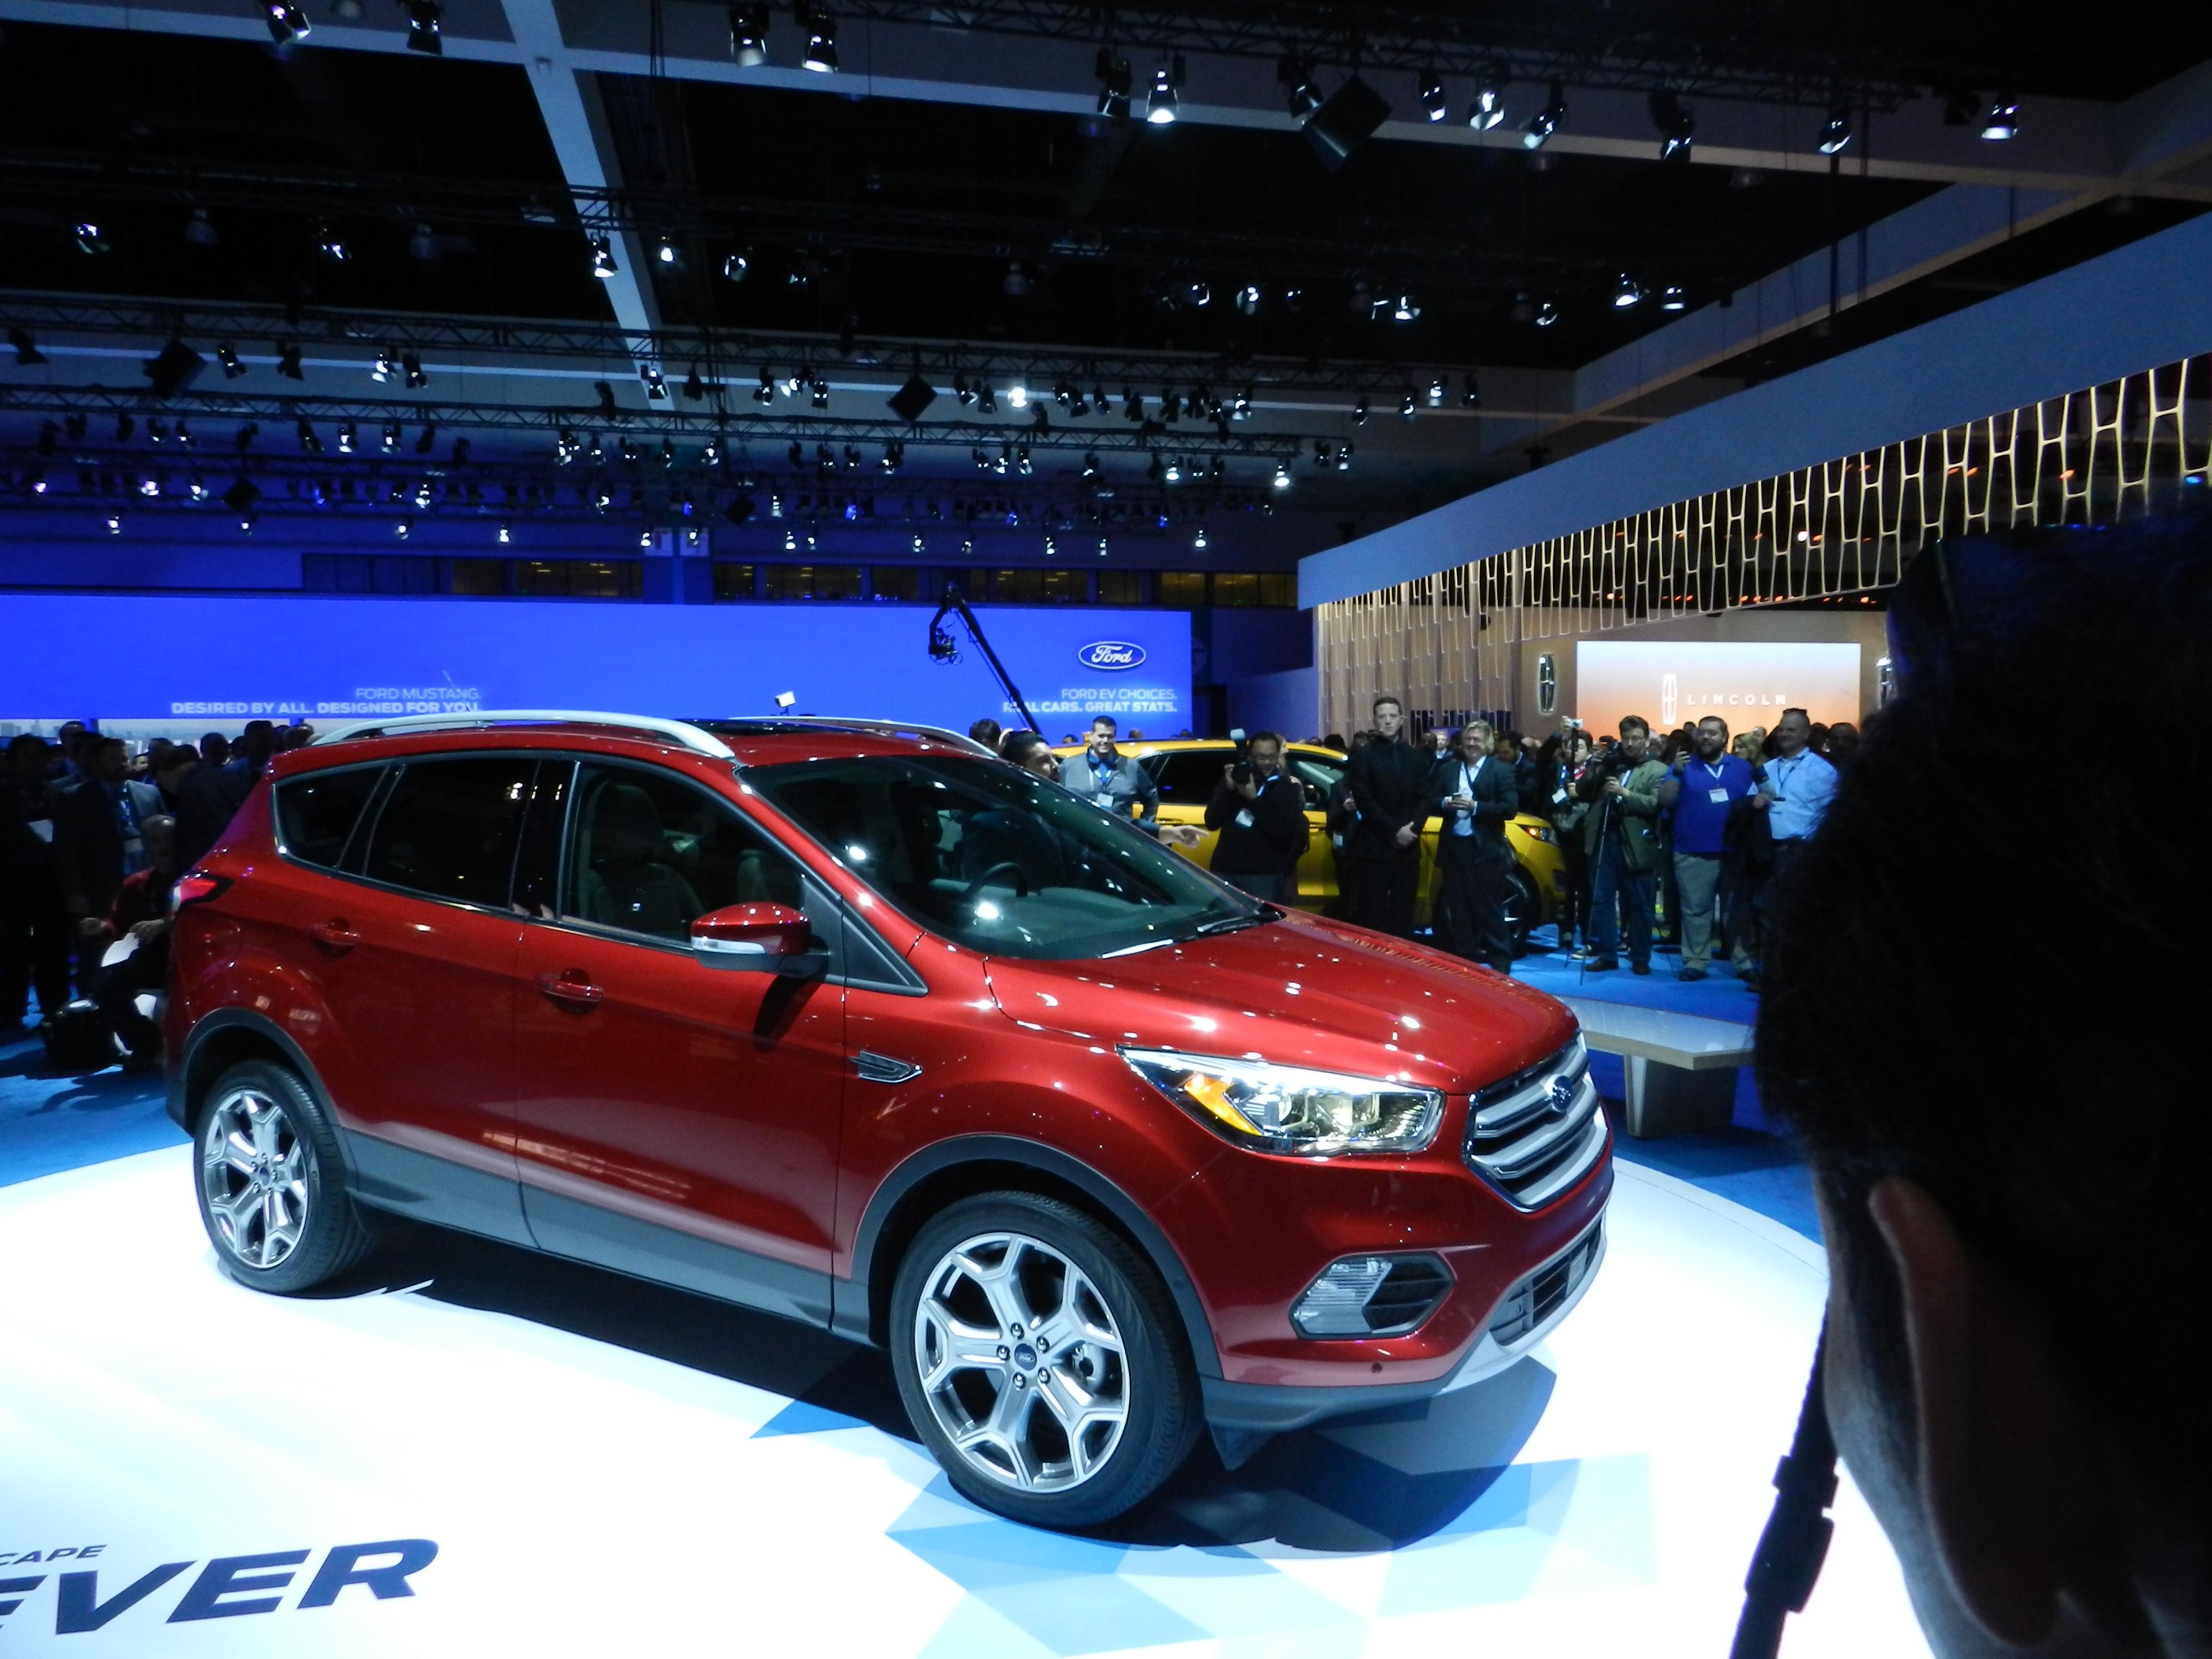 2015 L.A. Auto Show: SUVs